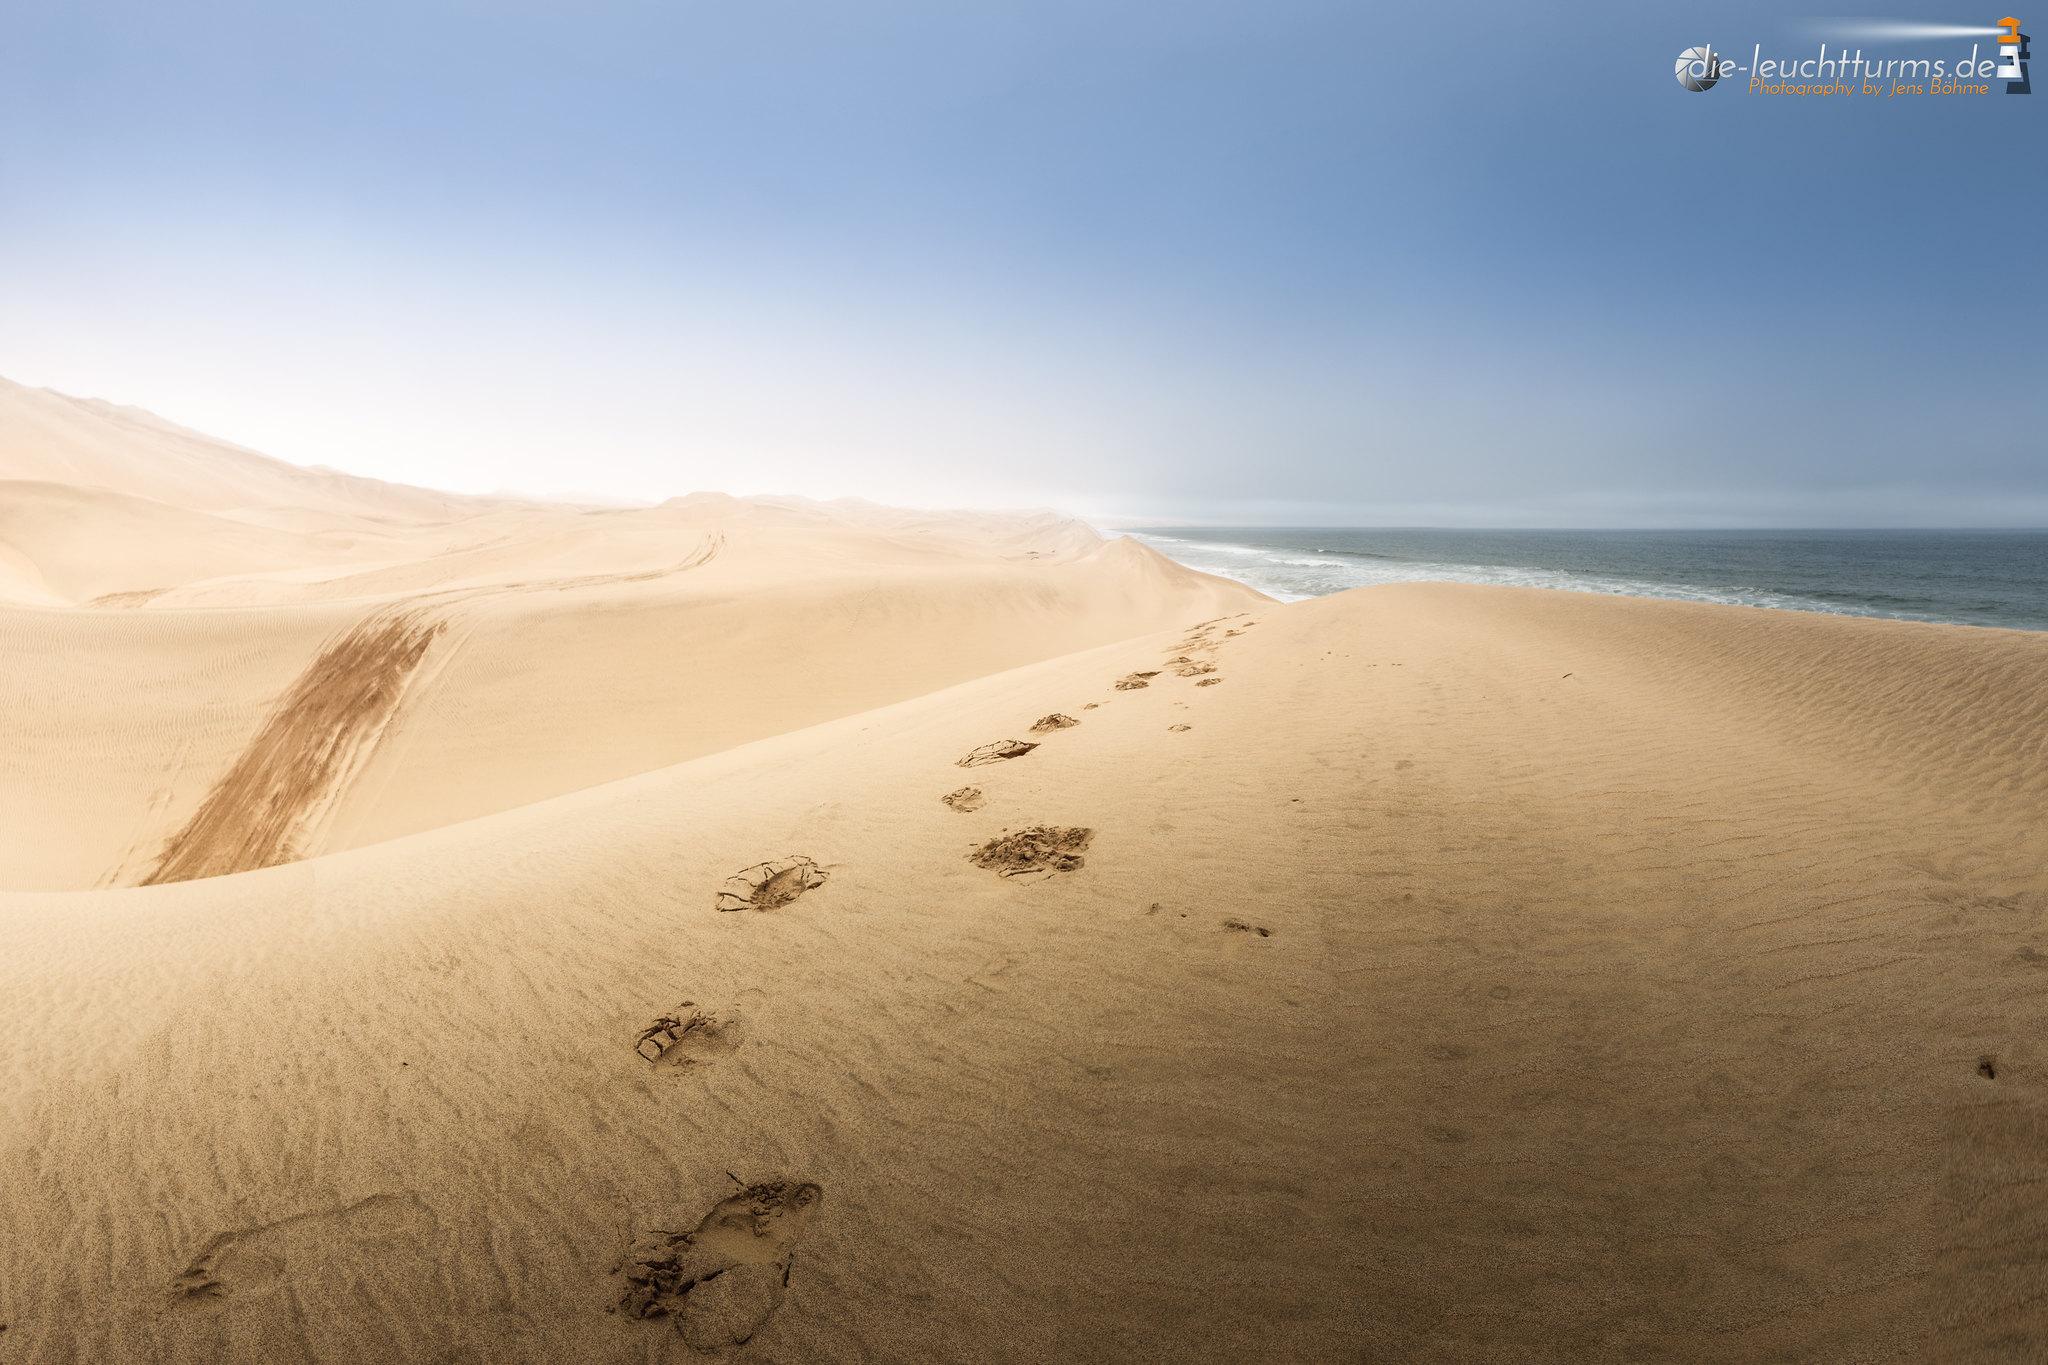 Where the desert meets the ocean